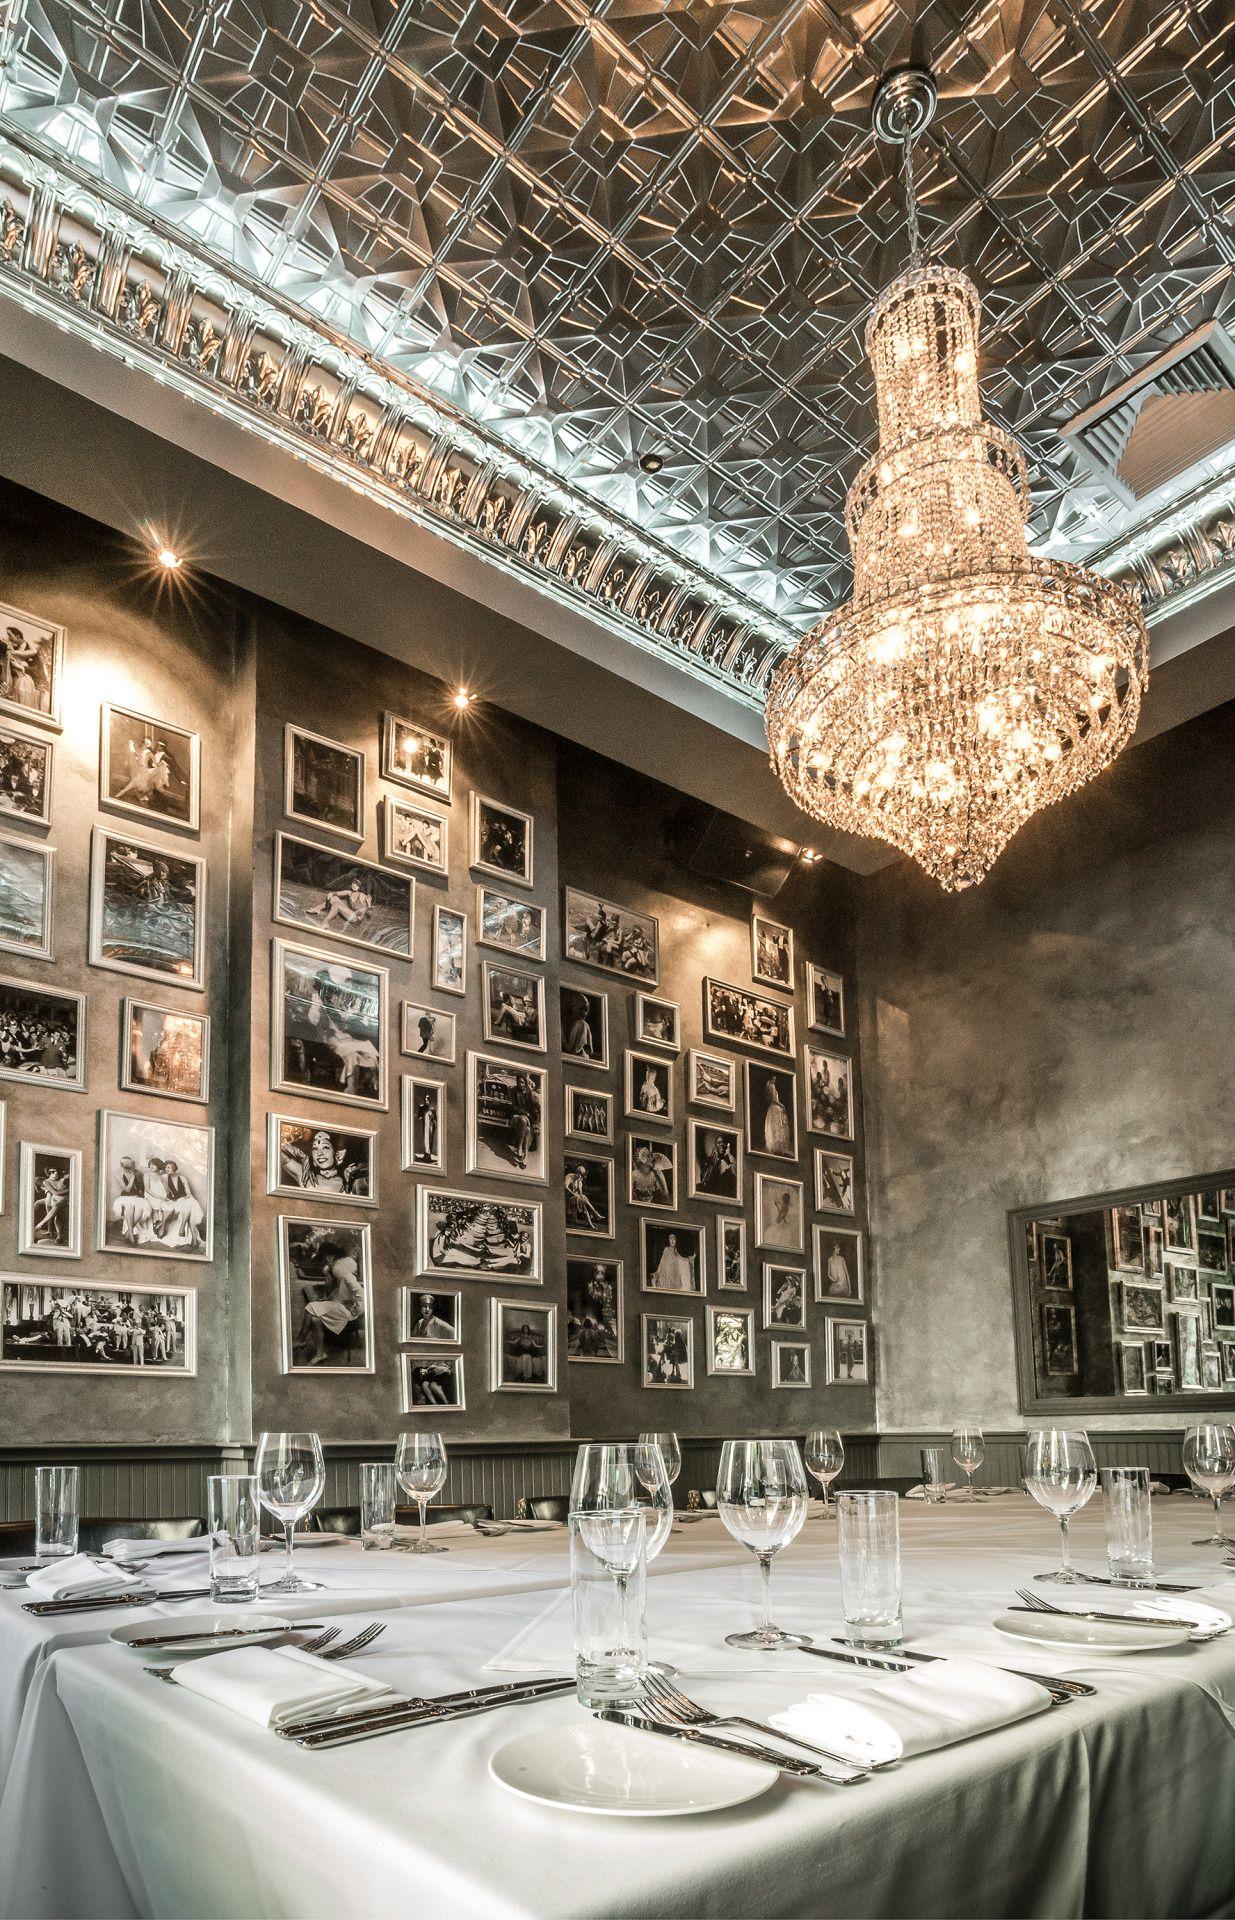 An Australian Designed Restaurant In New York Months Were Spent Restoring